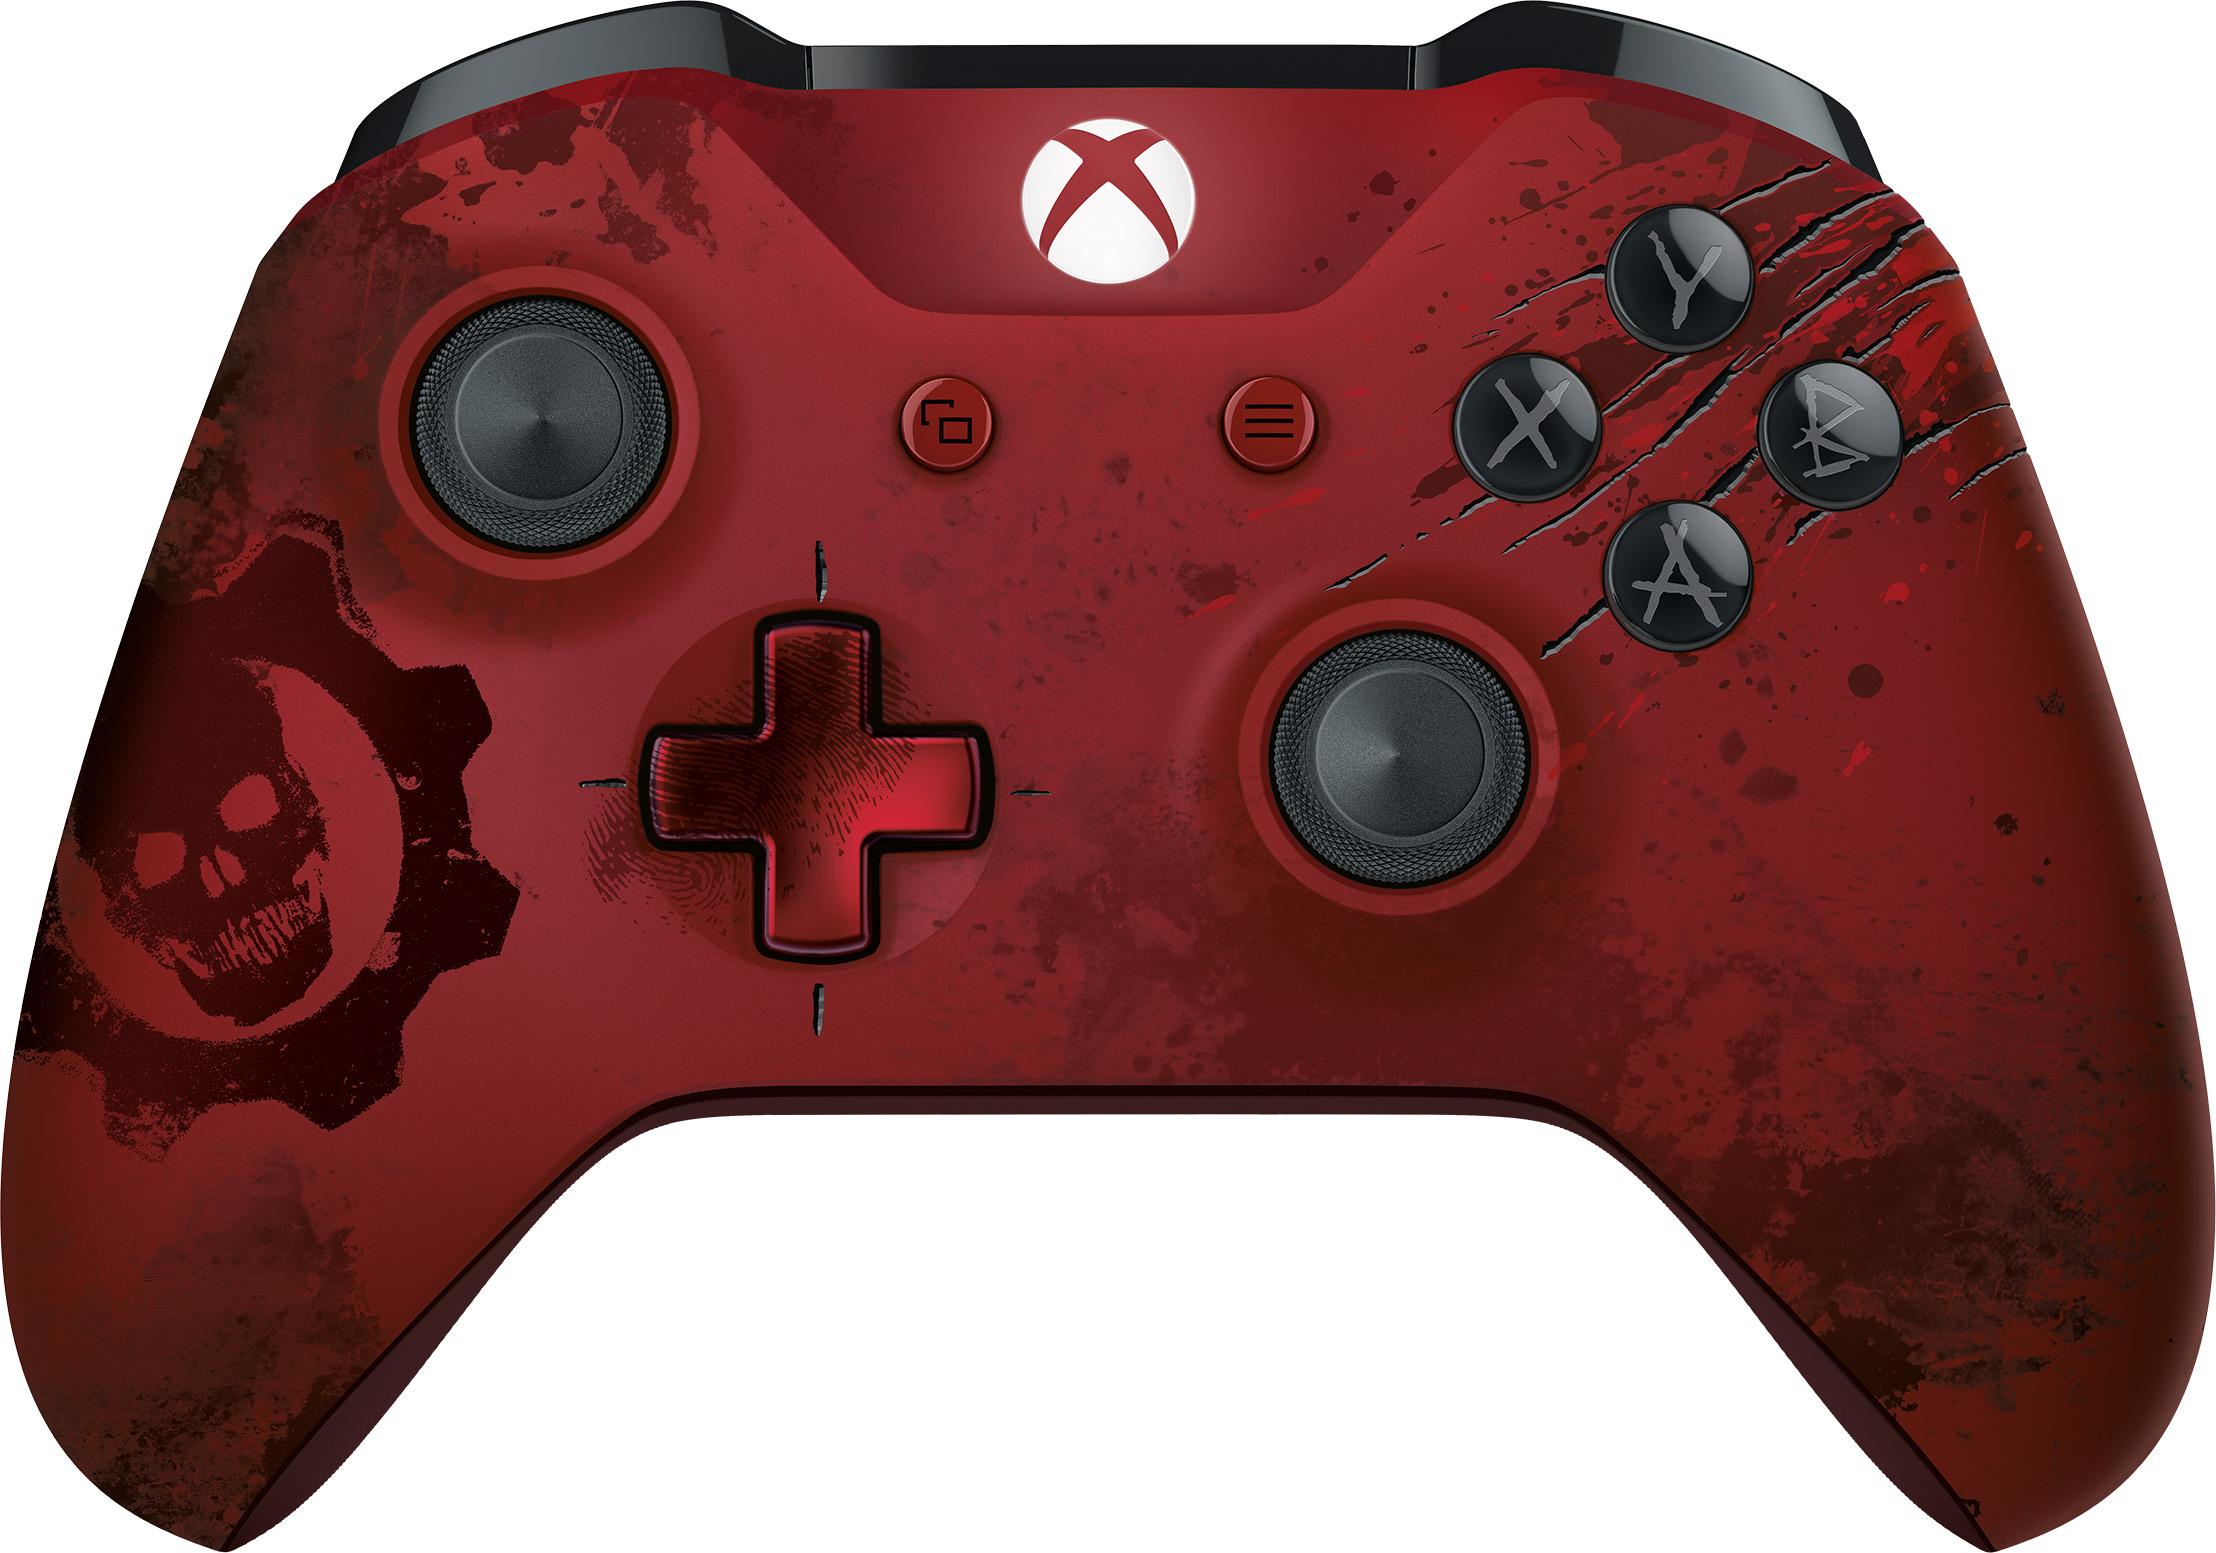 Gears of War 4 Crimson Omen Limited Edition Xbox Wireless Controller